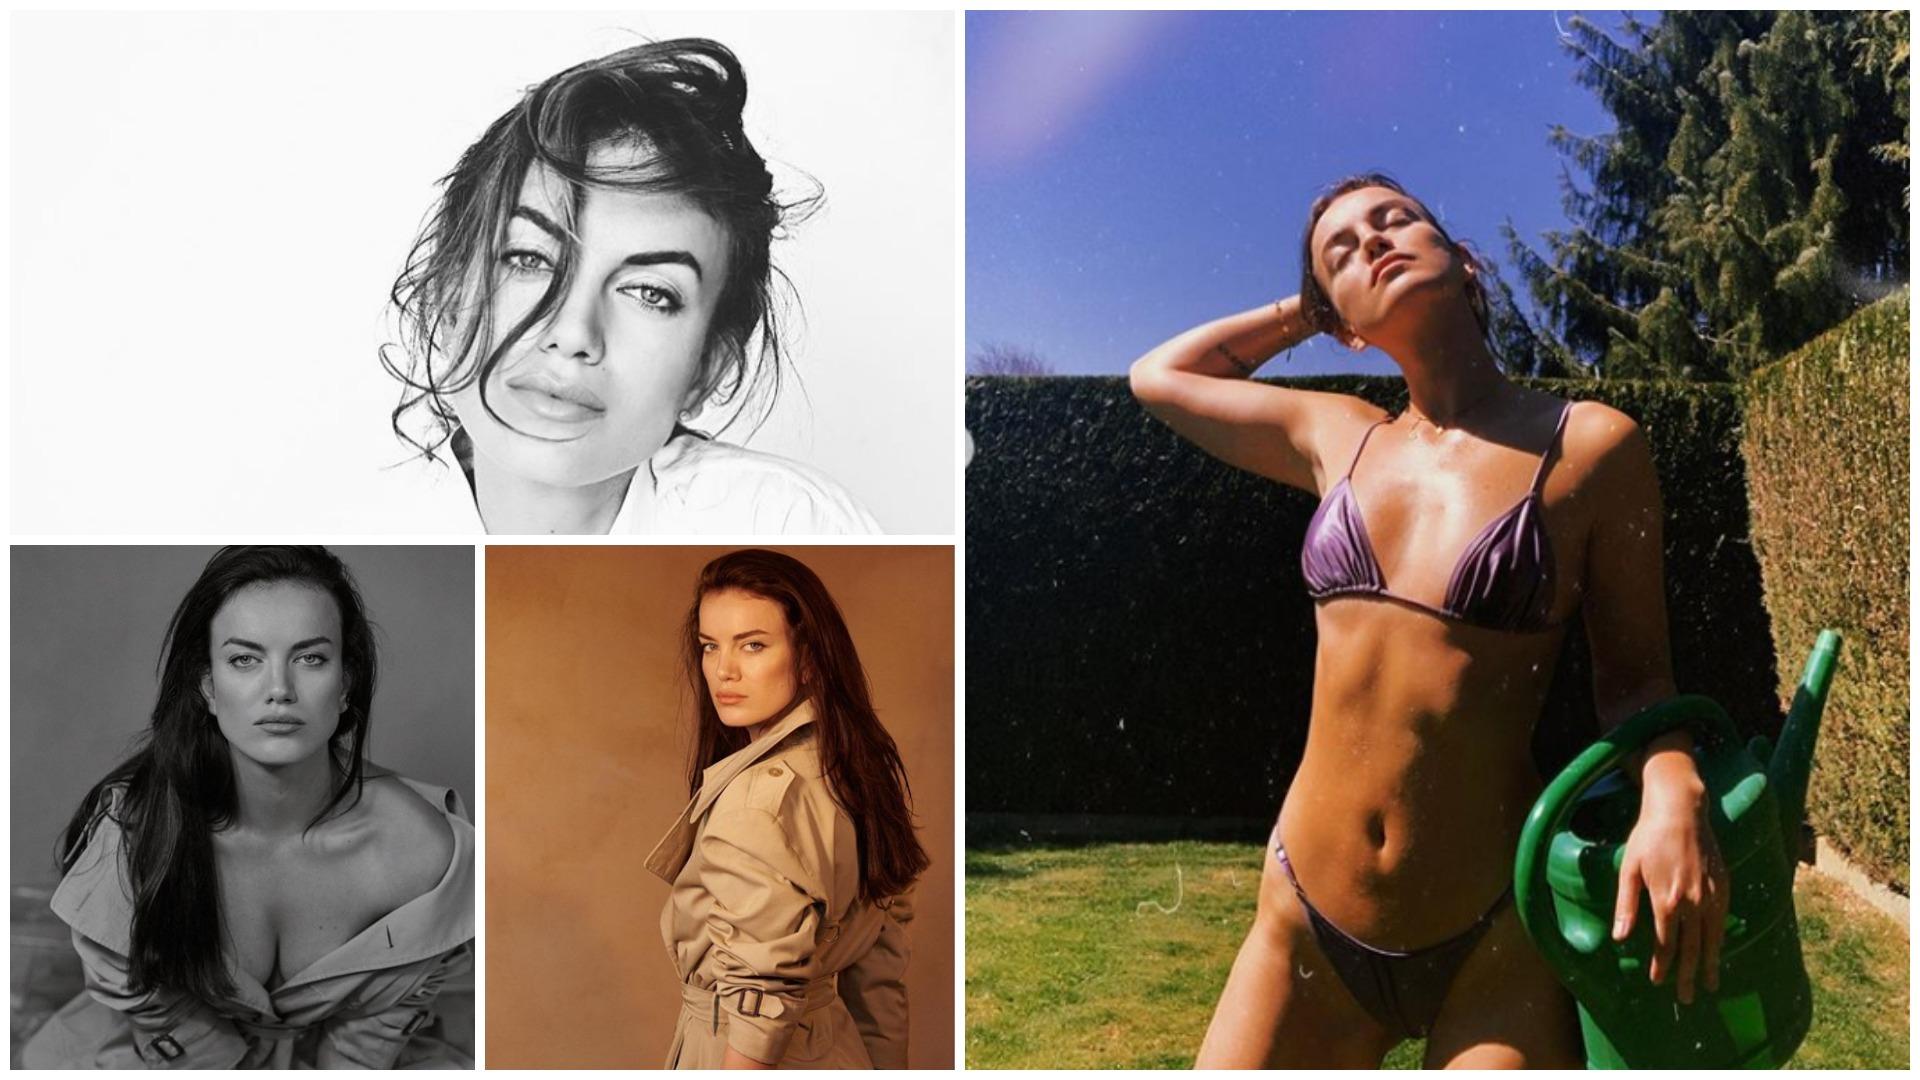 Konfirmohet ndarja, pse i dha fund modelja me boksierin Robin Krasniqi